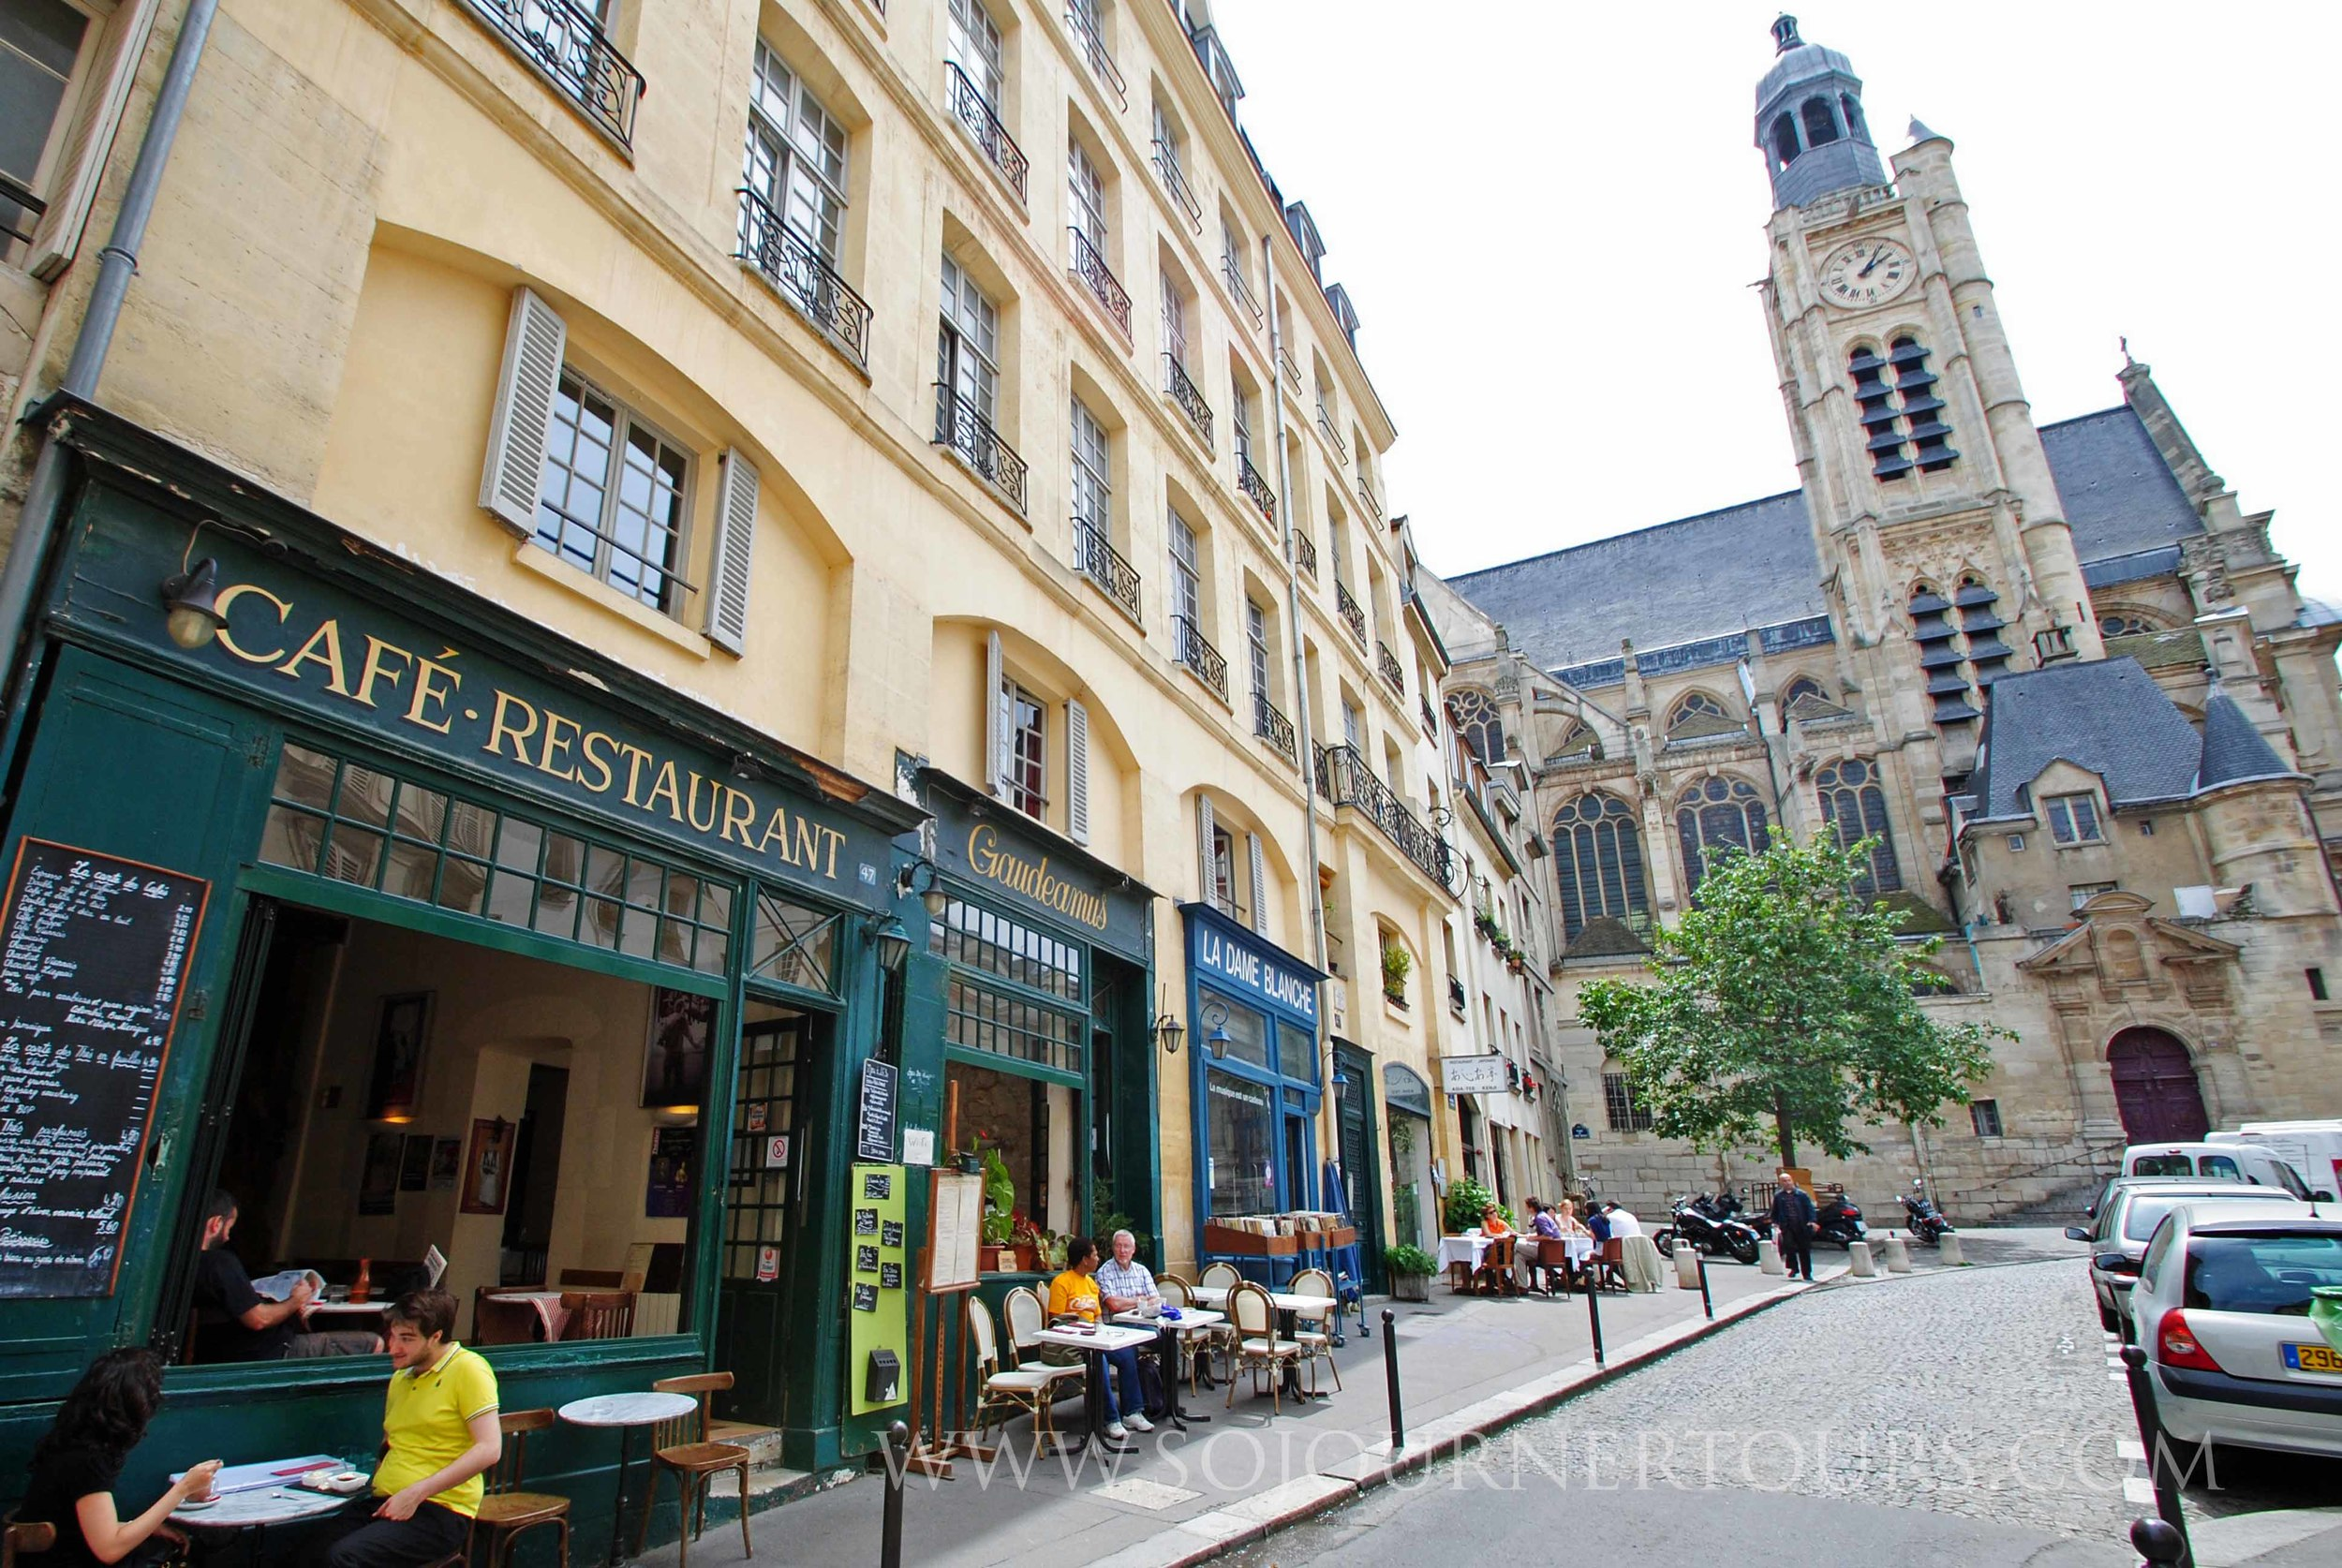 The Latin Quarter: Paris, France (Sojourner Tours)